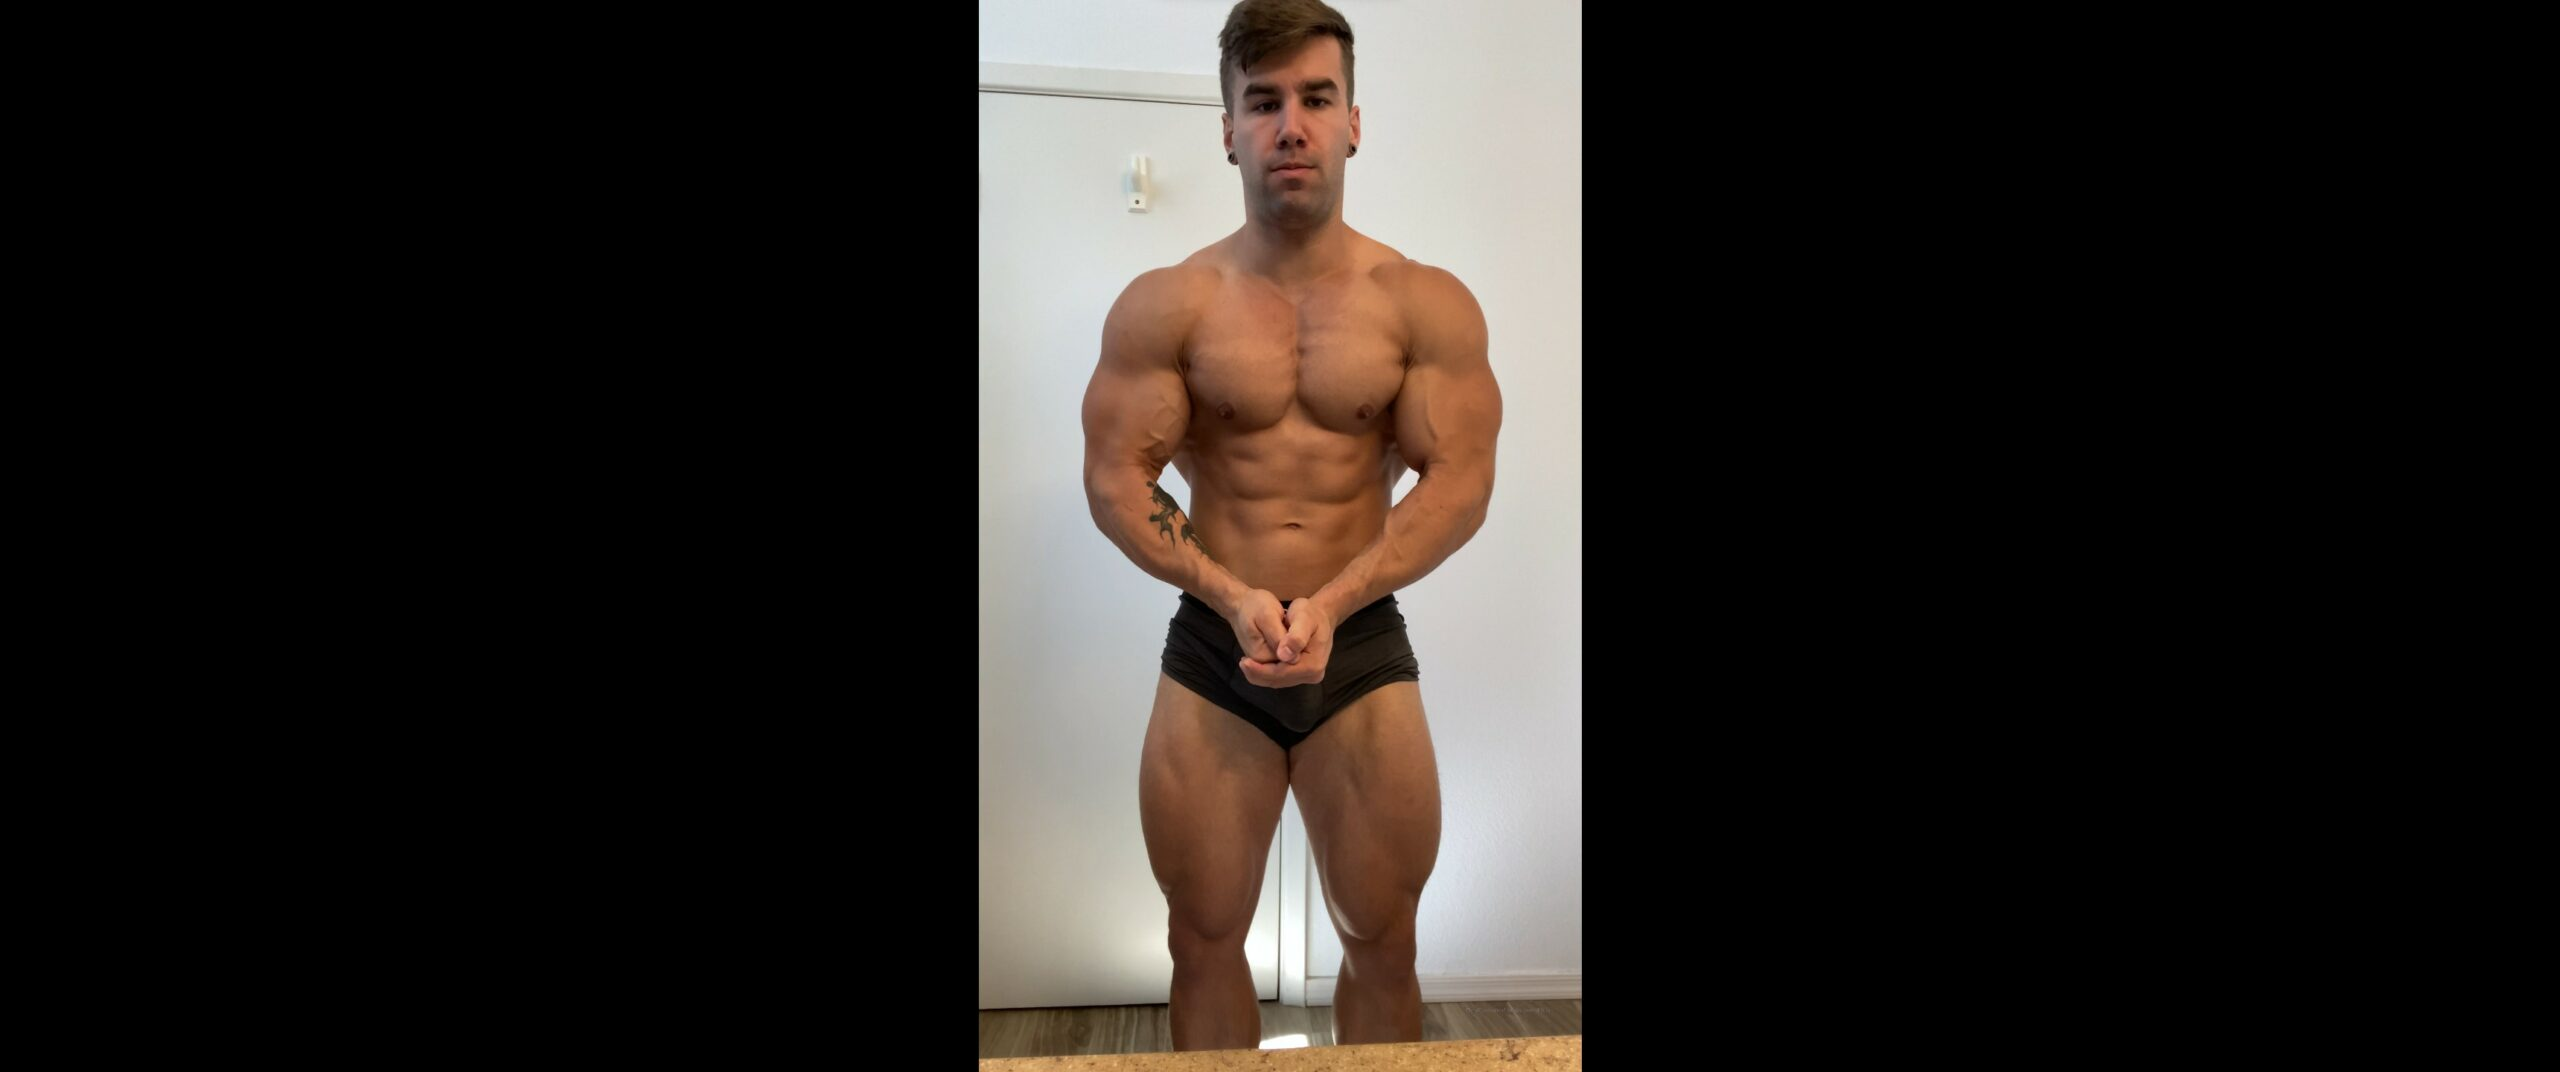 Showing off my muscles - Jake Burton (JakeBurtonOfficial)